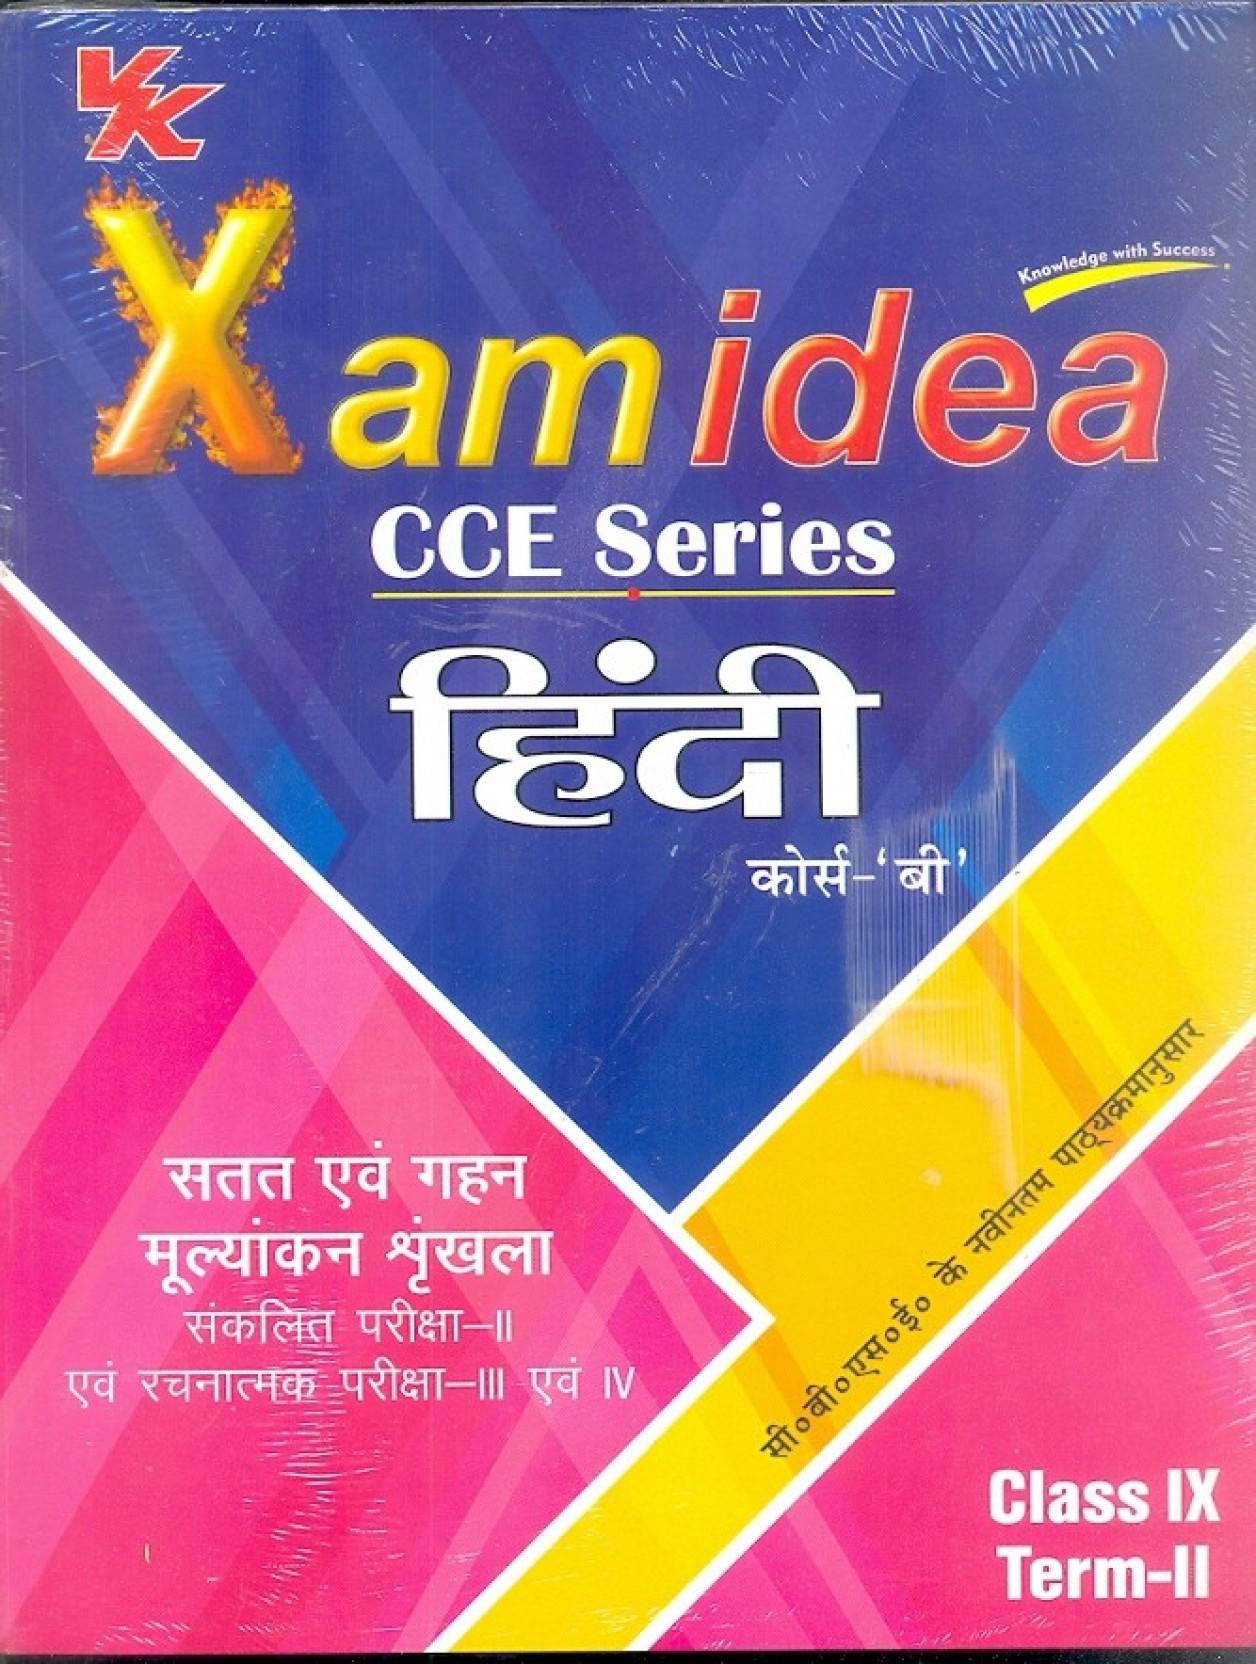 Xam Idea Class 10 Science Pdf 2018